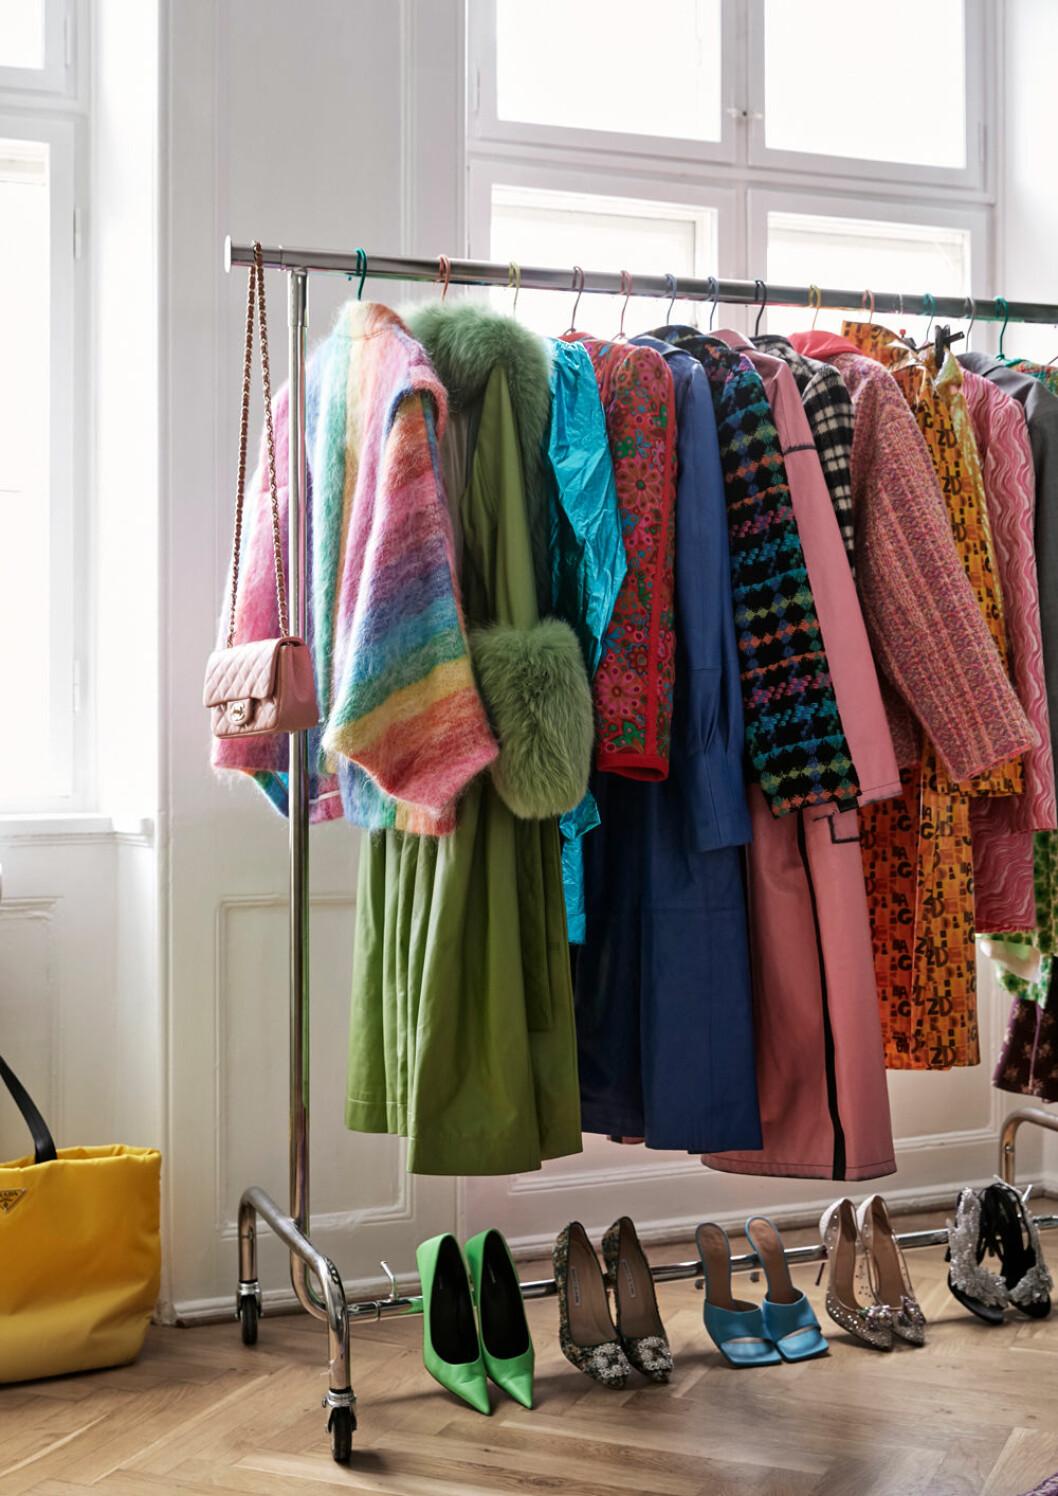 Hemma hos Emili Sindlev Köpenhamn garderob